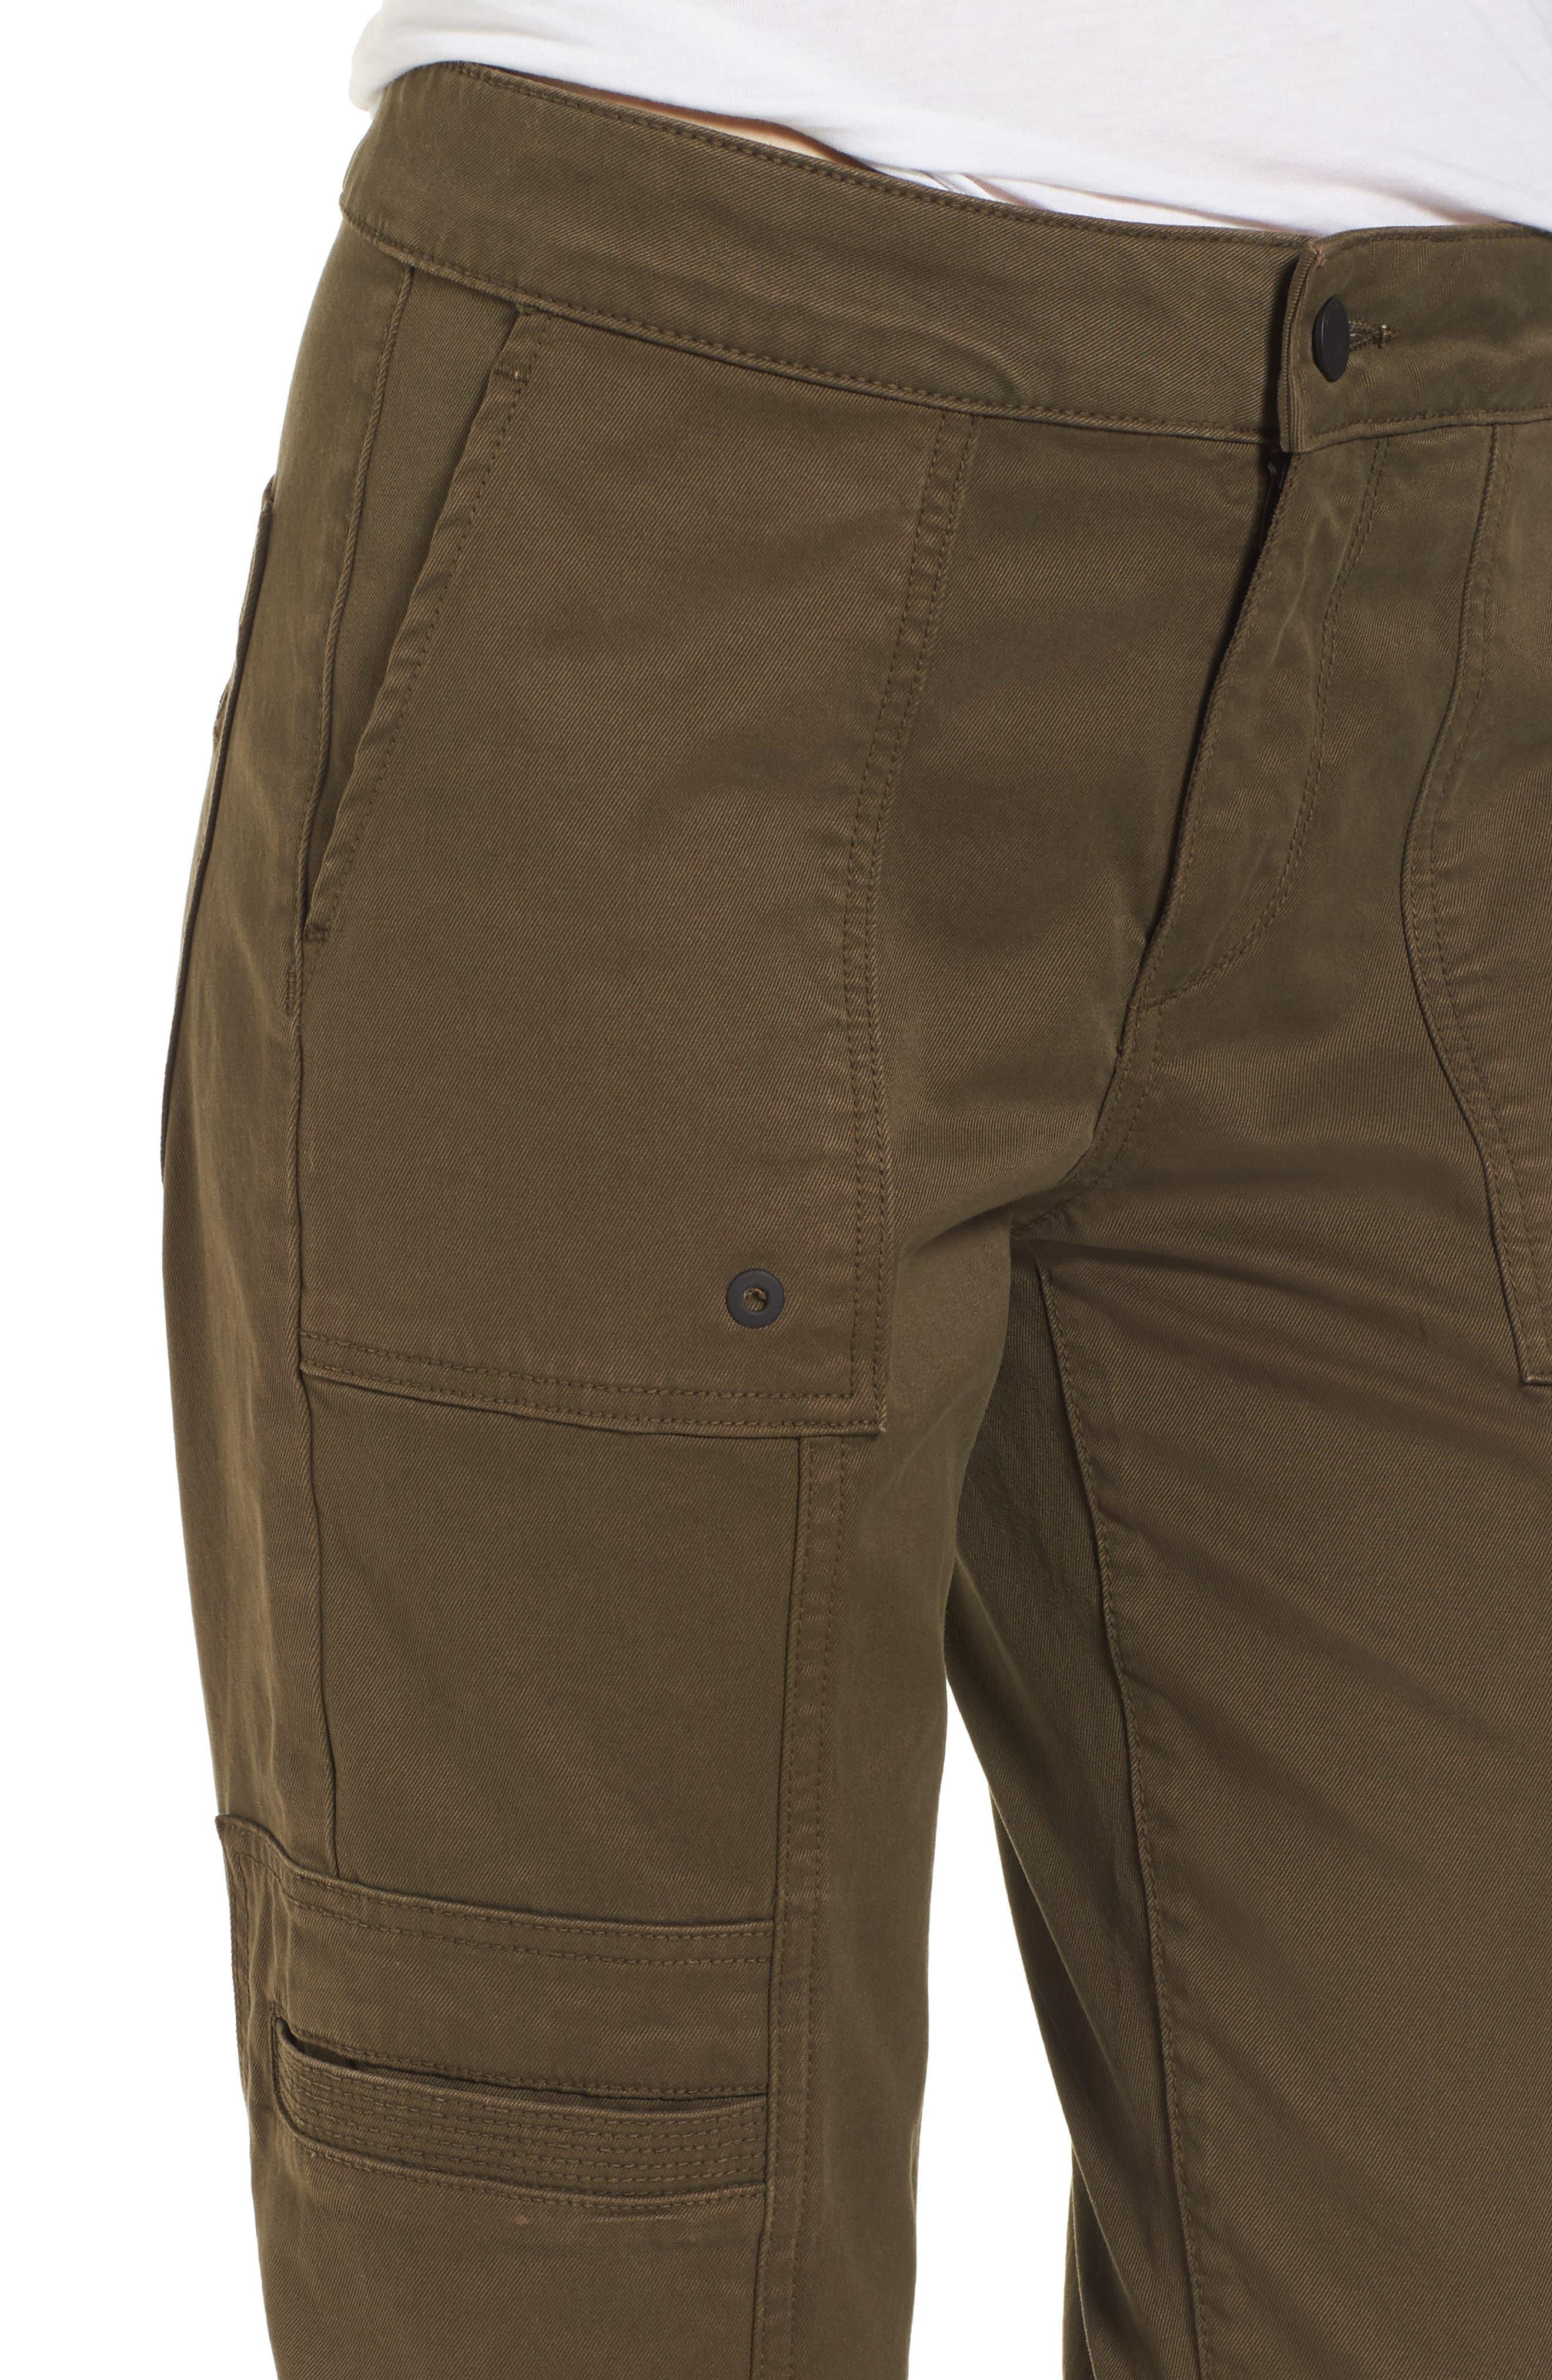 Elliot Slouchy Slim Cargo Pants,                             Alternate thumbnail 4, color,                             205